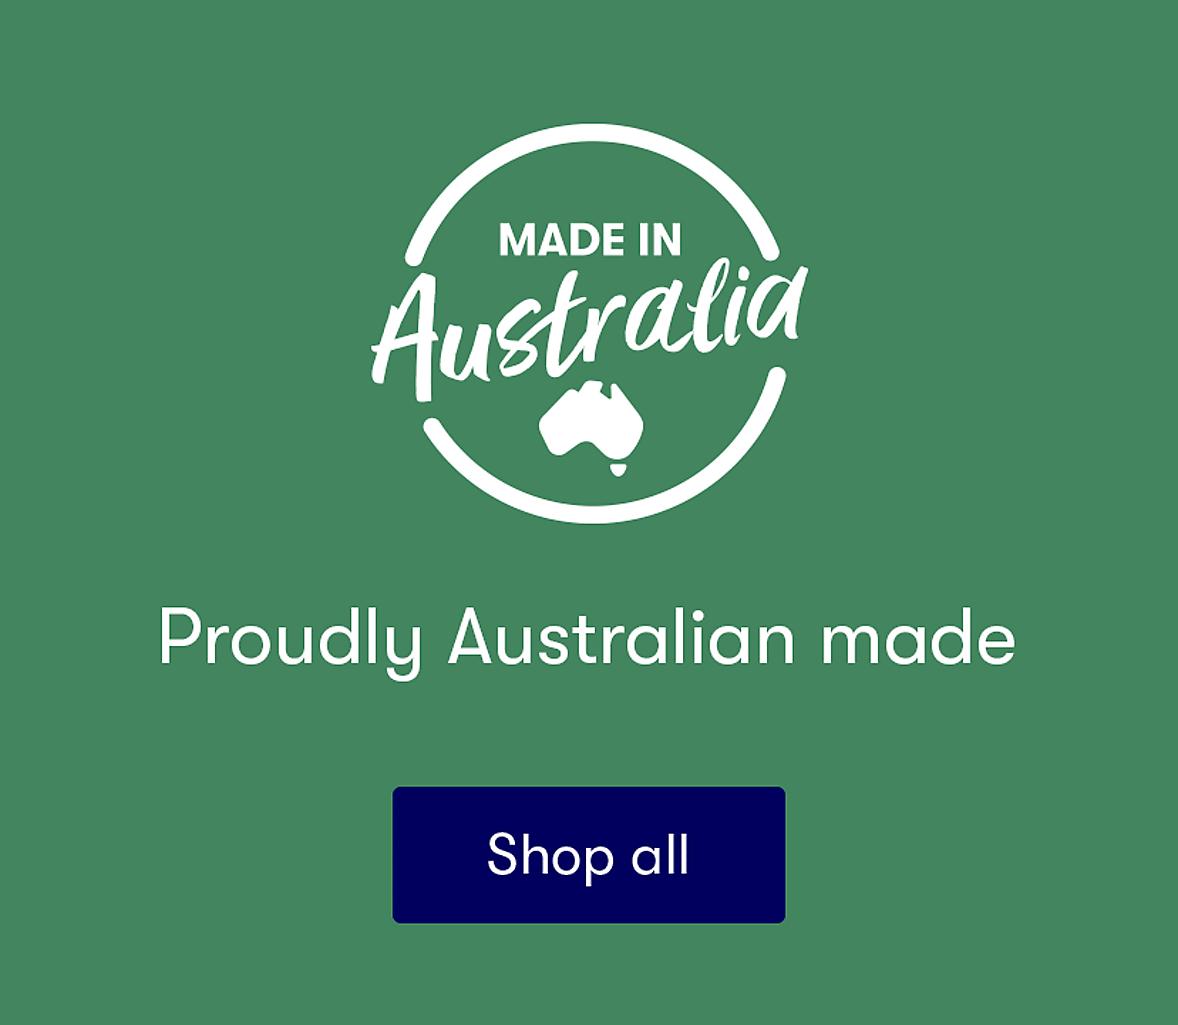 Proudly Australia made